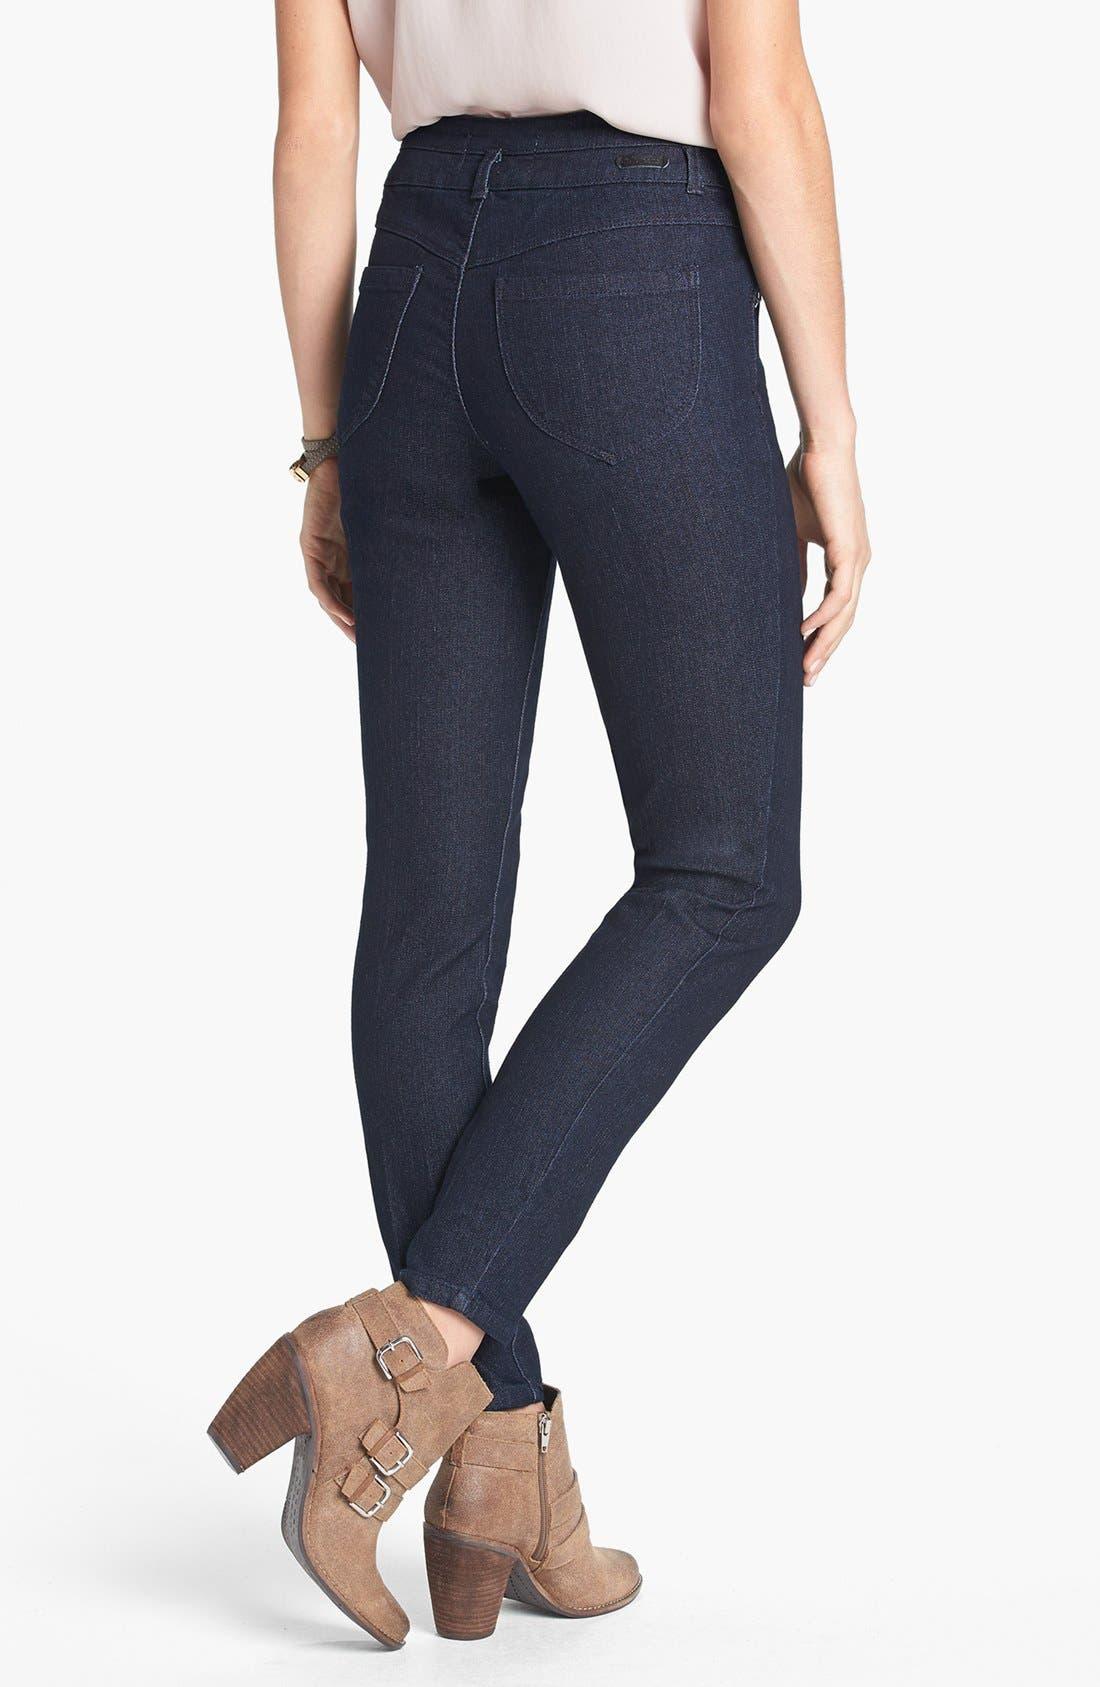 Alternate Image 2  - Jolt High Waist Skinny Ankle Jeans (Juniors) (Online Only)